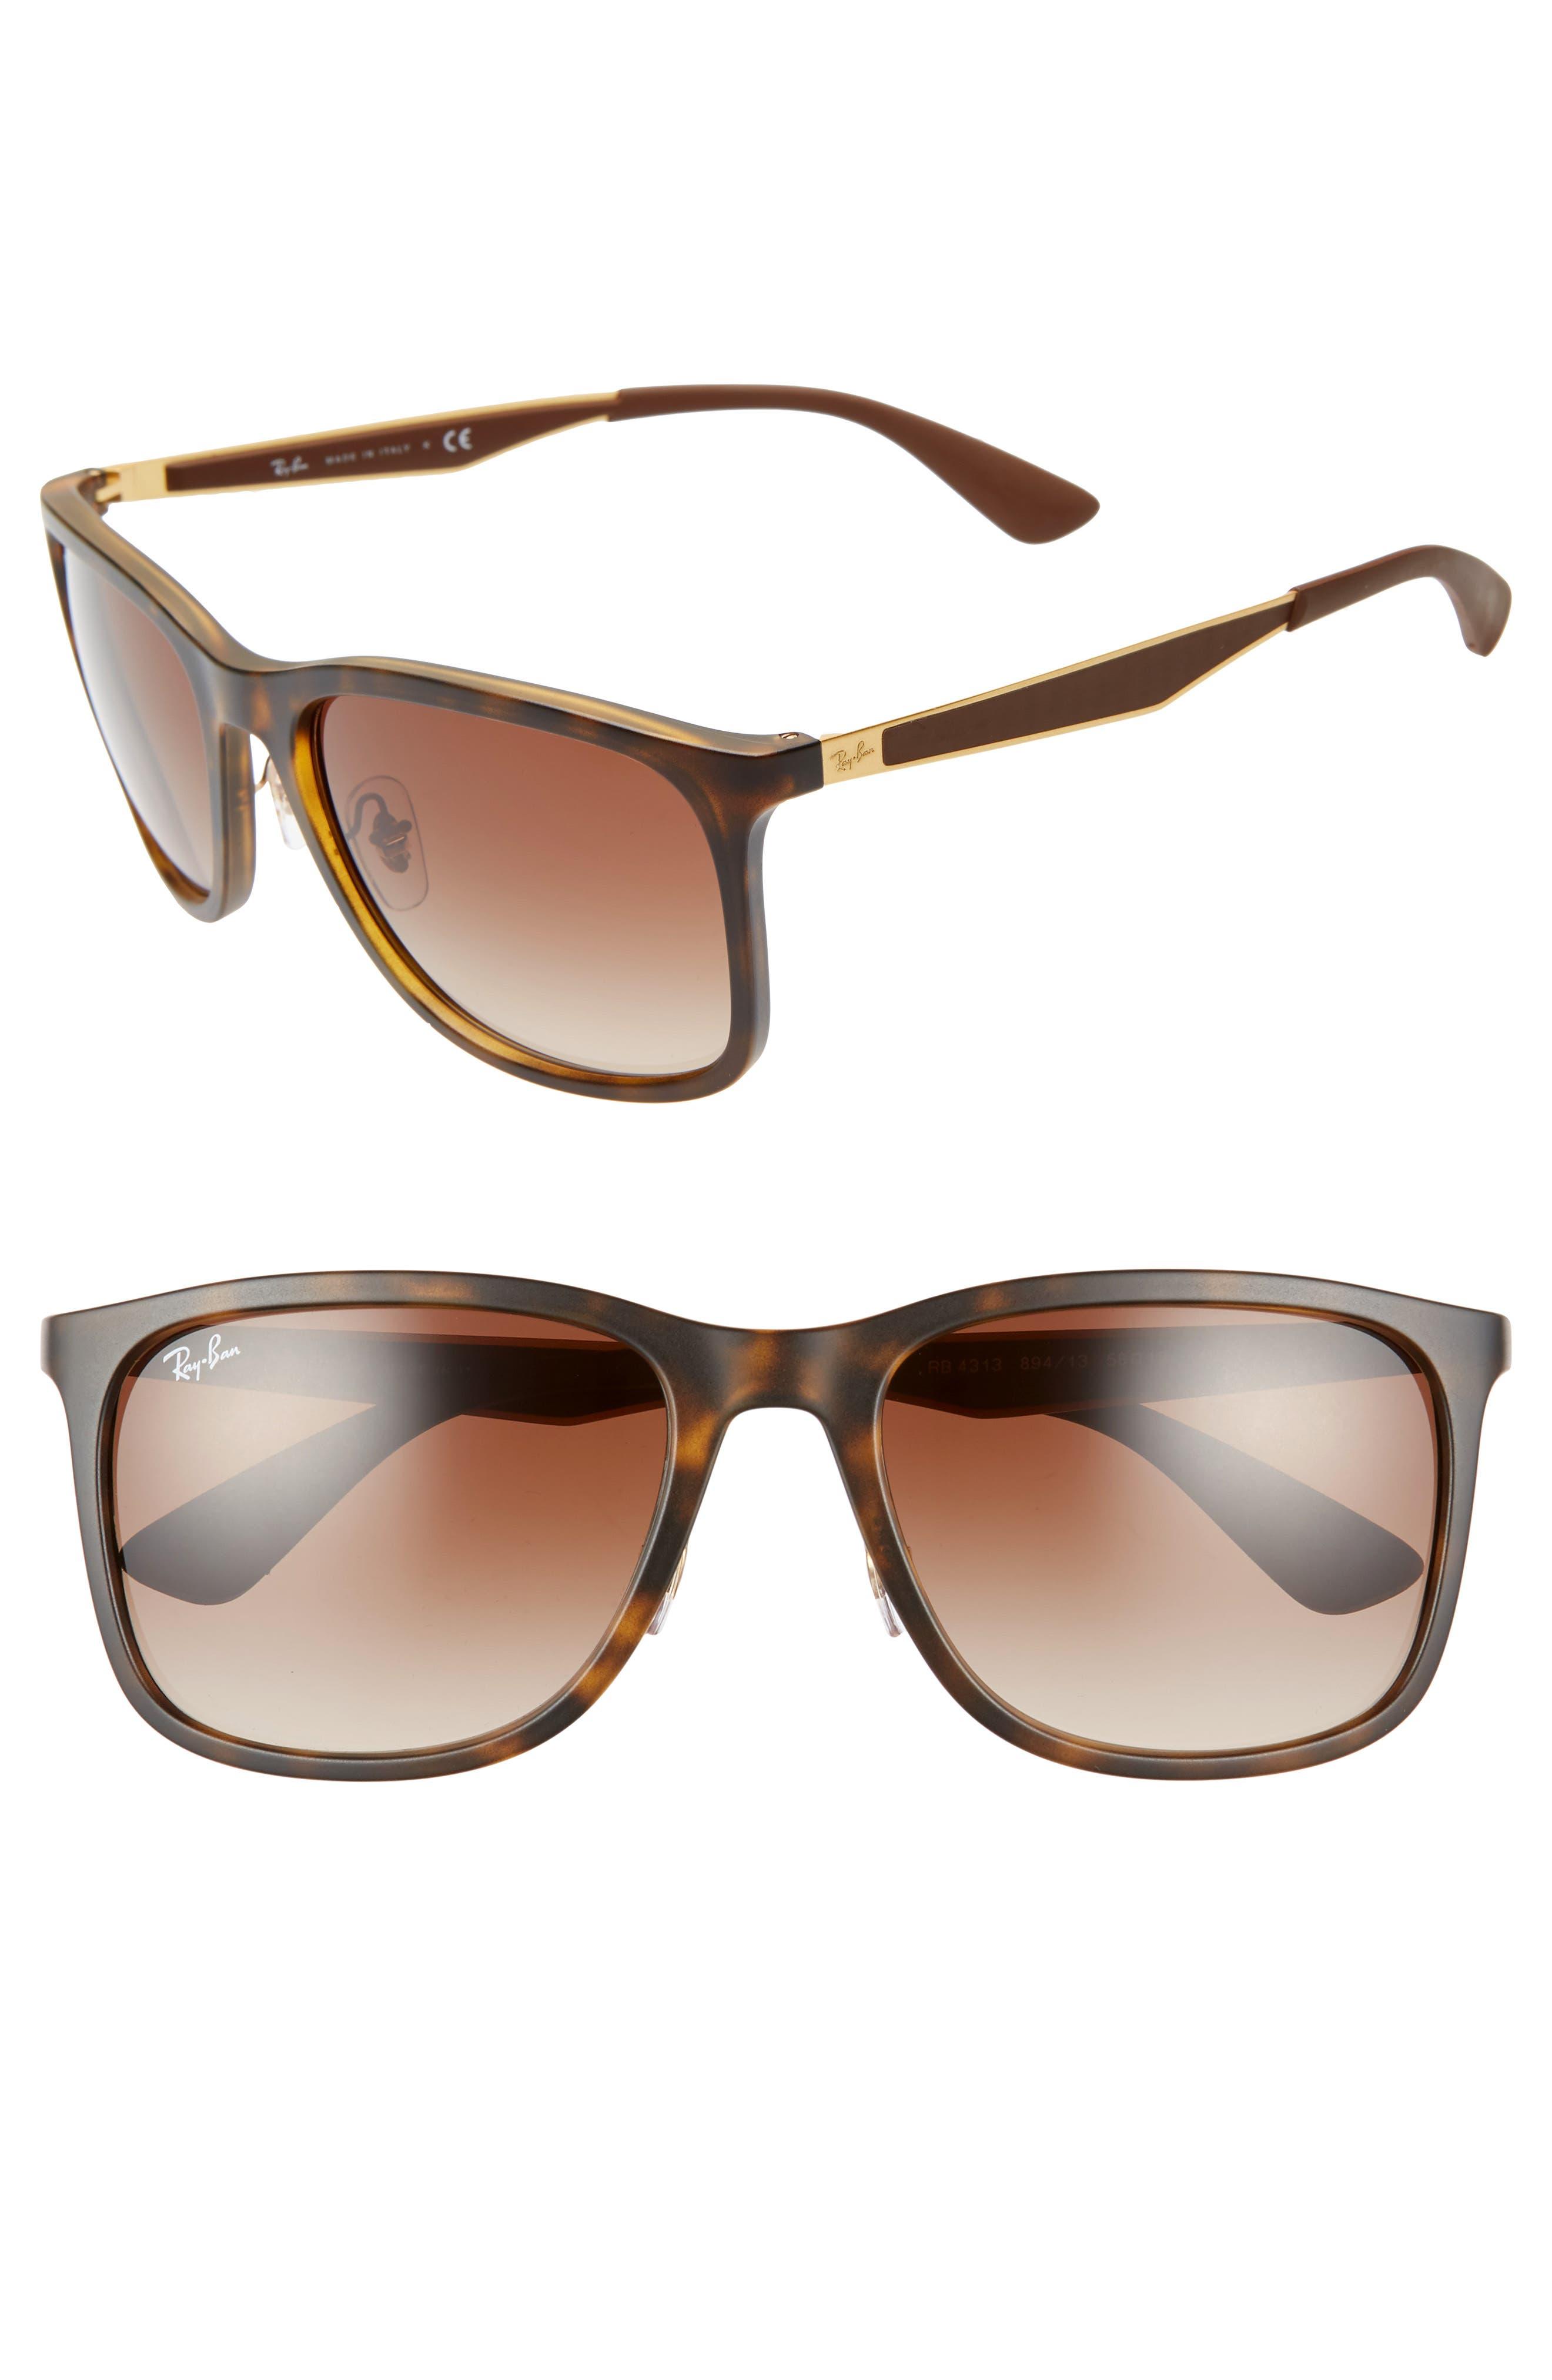 Ray-Ban 5m Square Sunglasses - Matte Havana